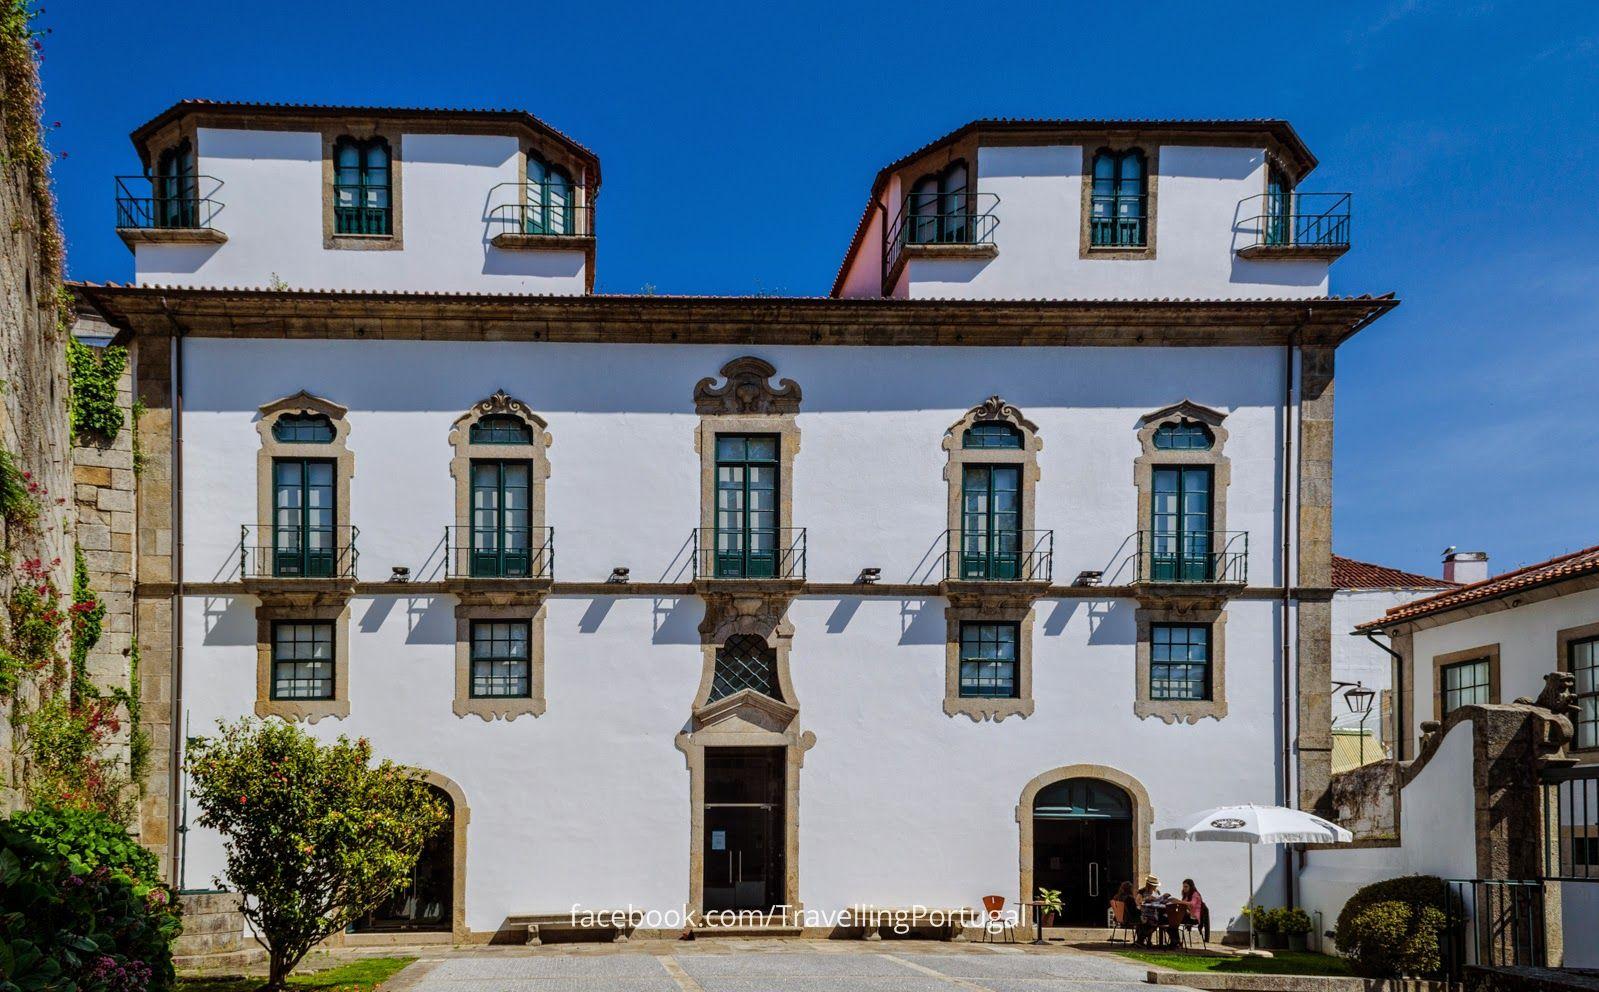 Casa Museu Guerra Junqueiro en Oporto Portugal Turismo